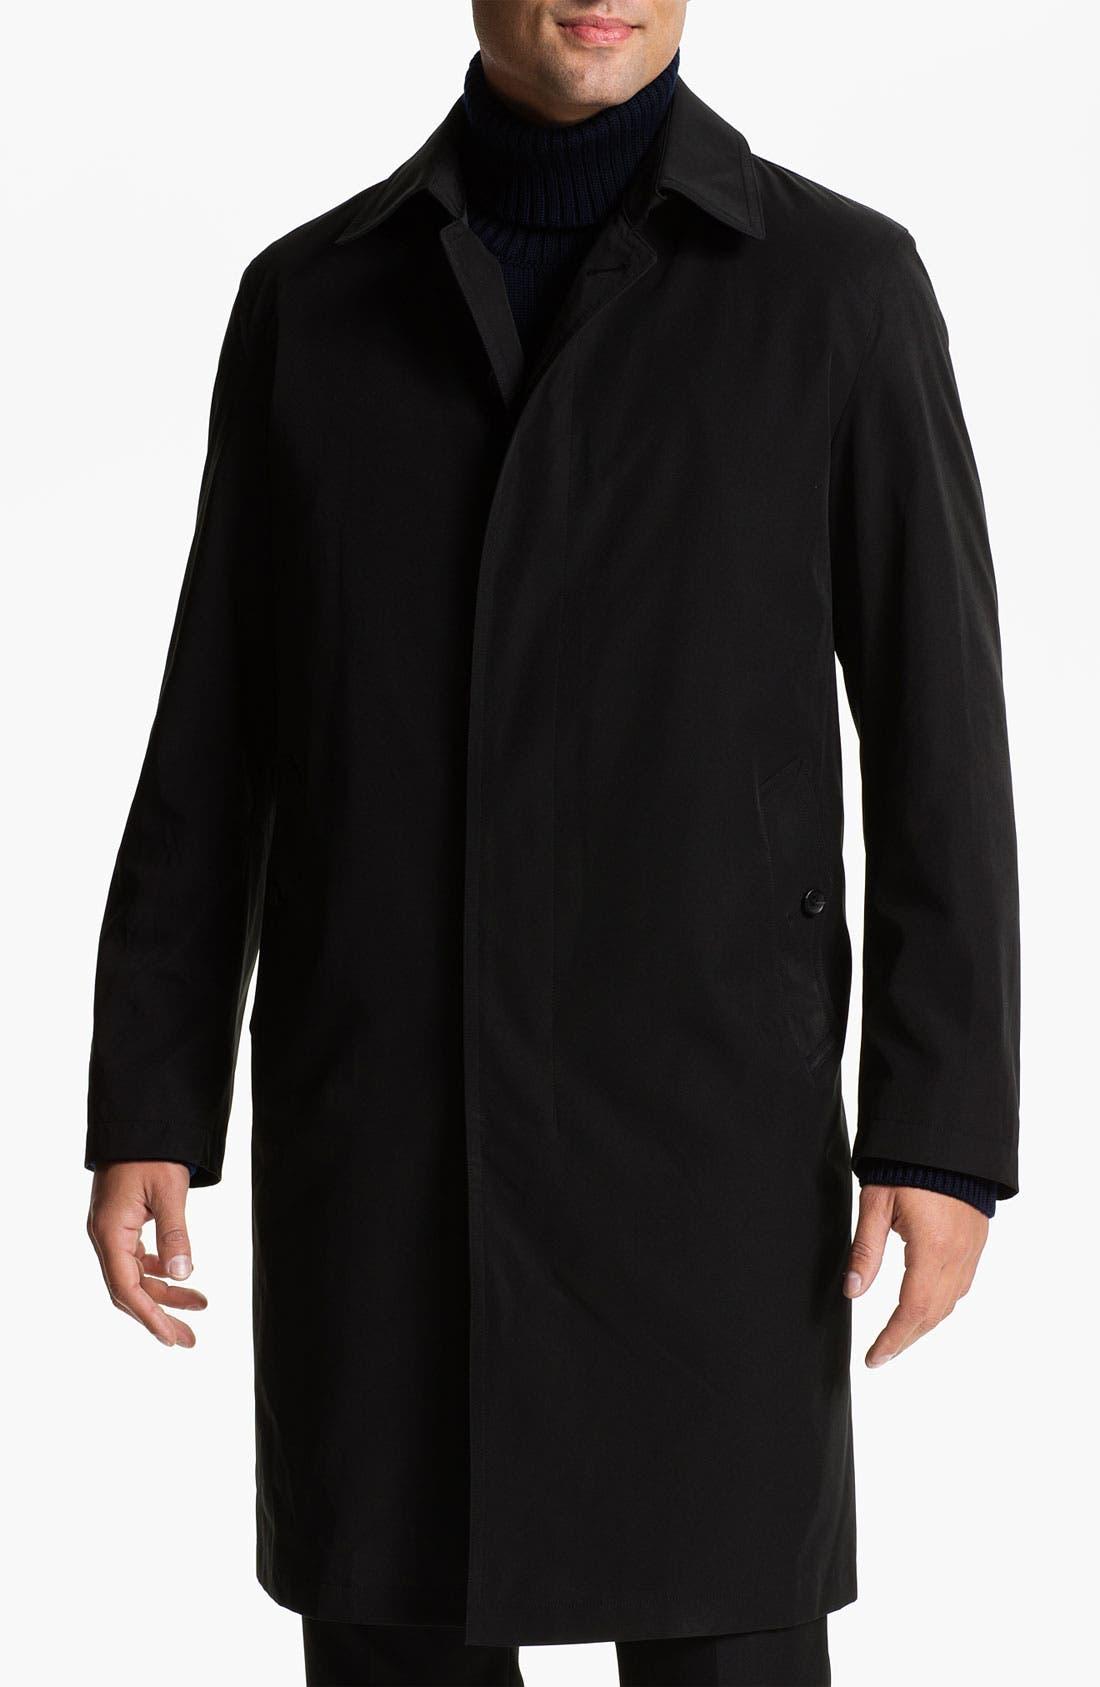 Main Image - Sanyo 'City' Top Coat